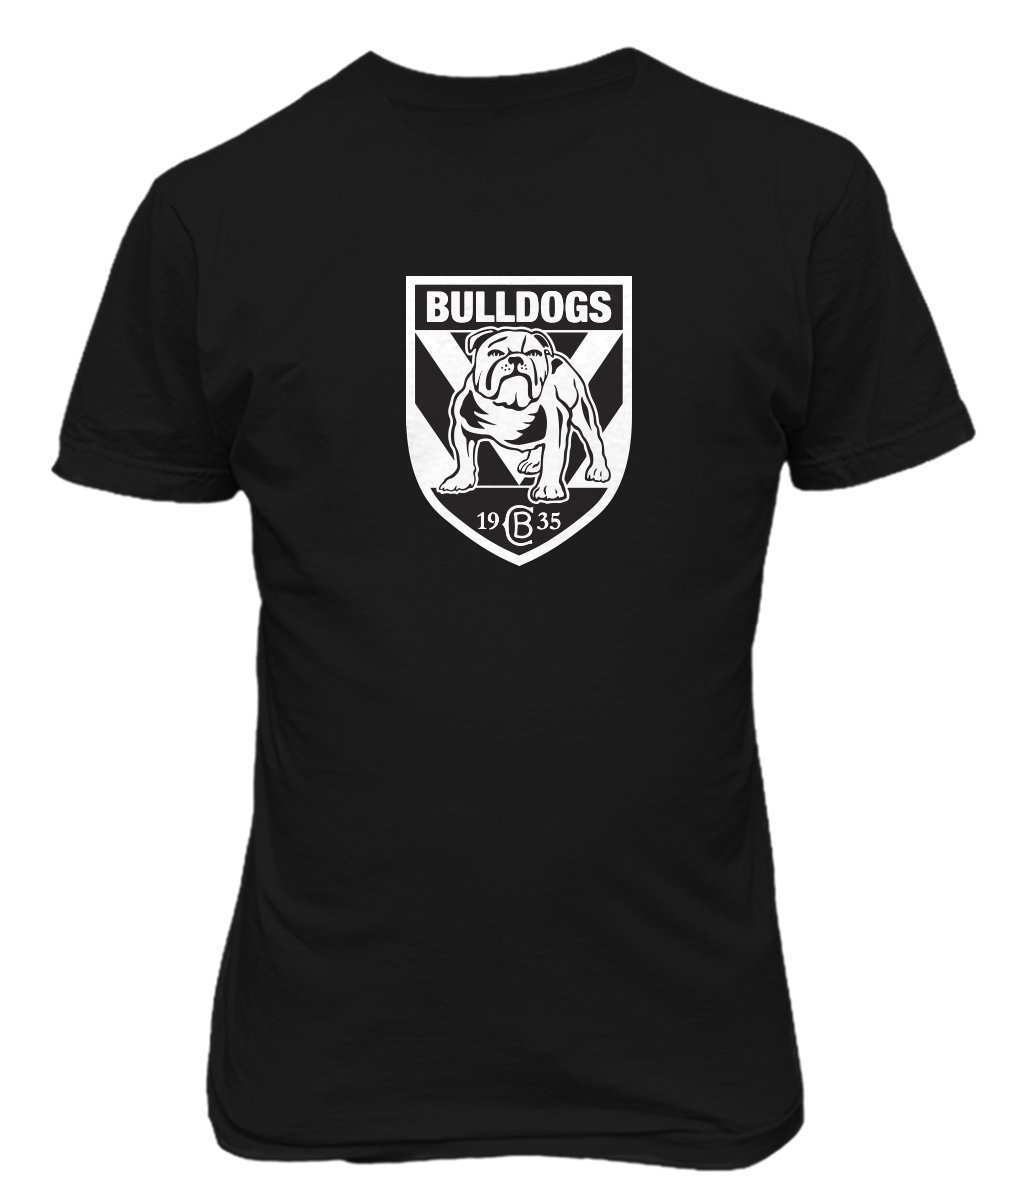 Tjsports Canterbury Bankstown Bulldogs Rugby Australia T Shirt Black